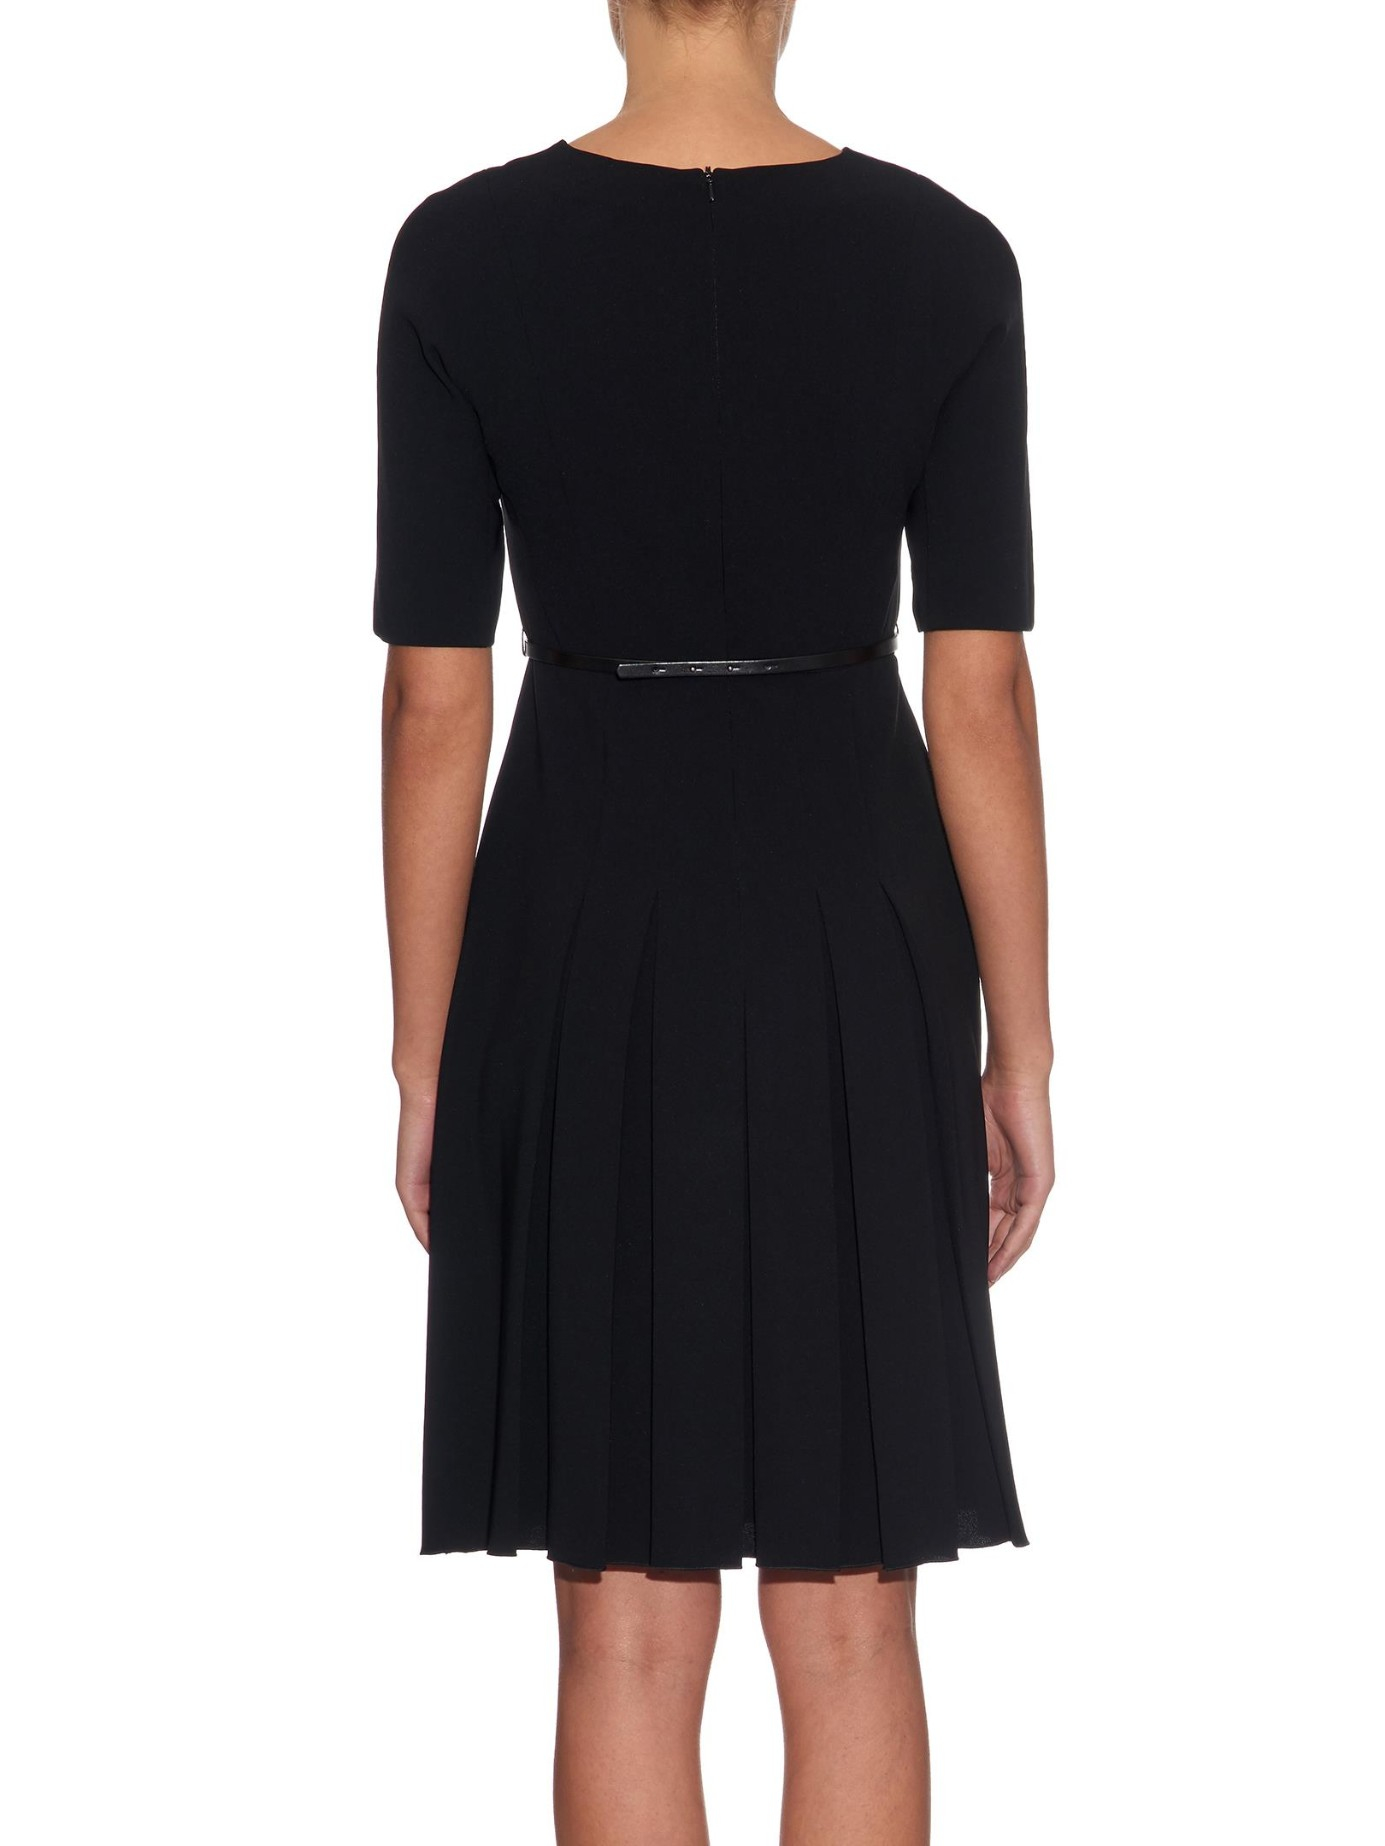 max mara studio dalida dress in black lyst. Black Bedroom Furniture Sets. Home Design Ideas